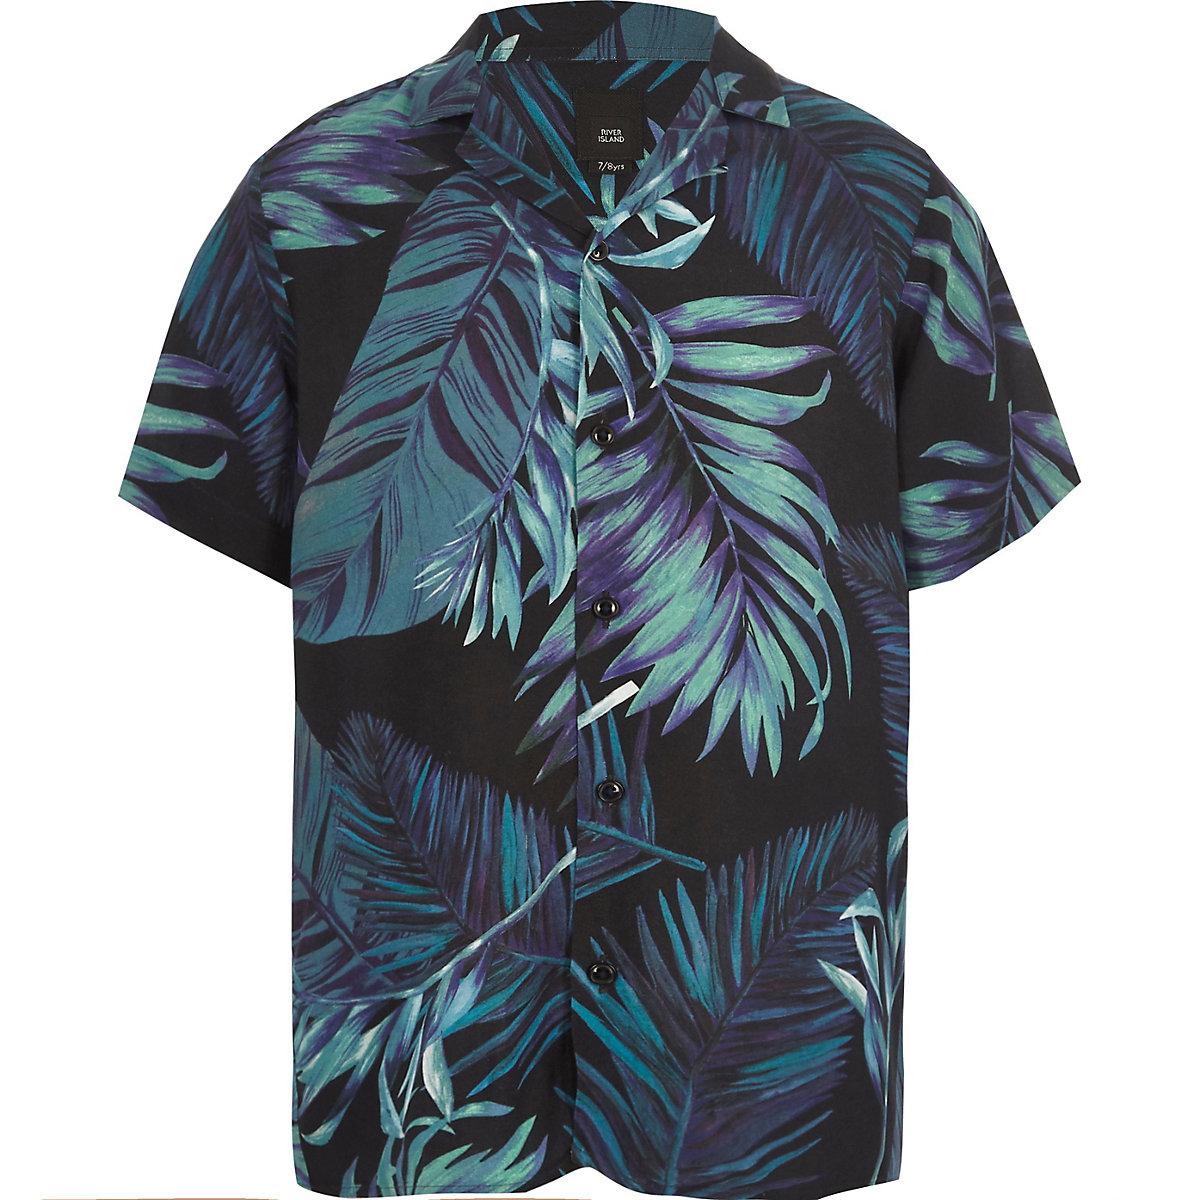 Marineblaues Kurzarmhemd mit Blätterprint